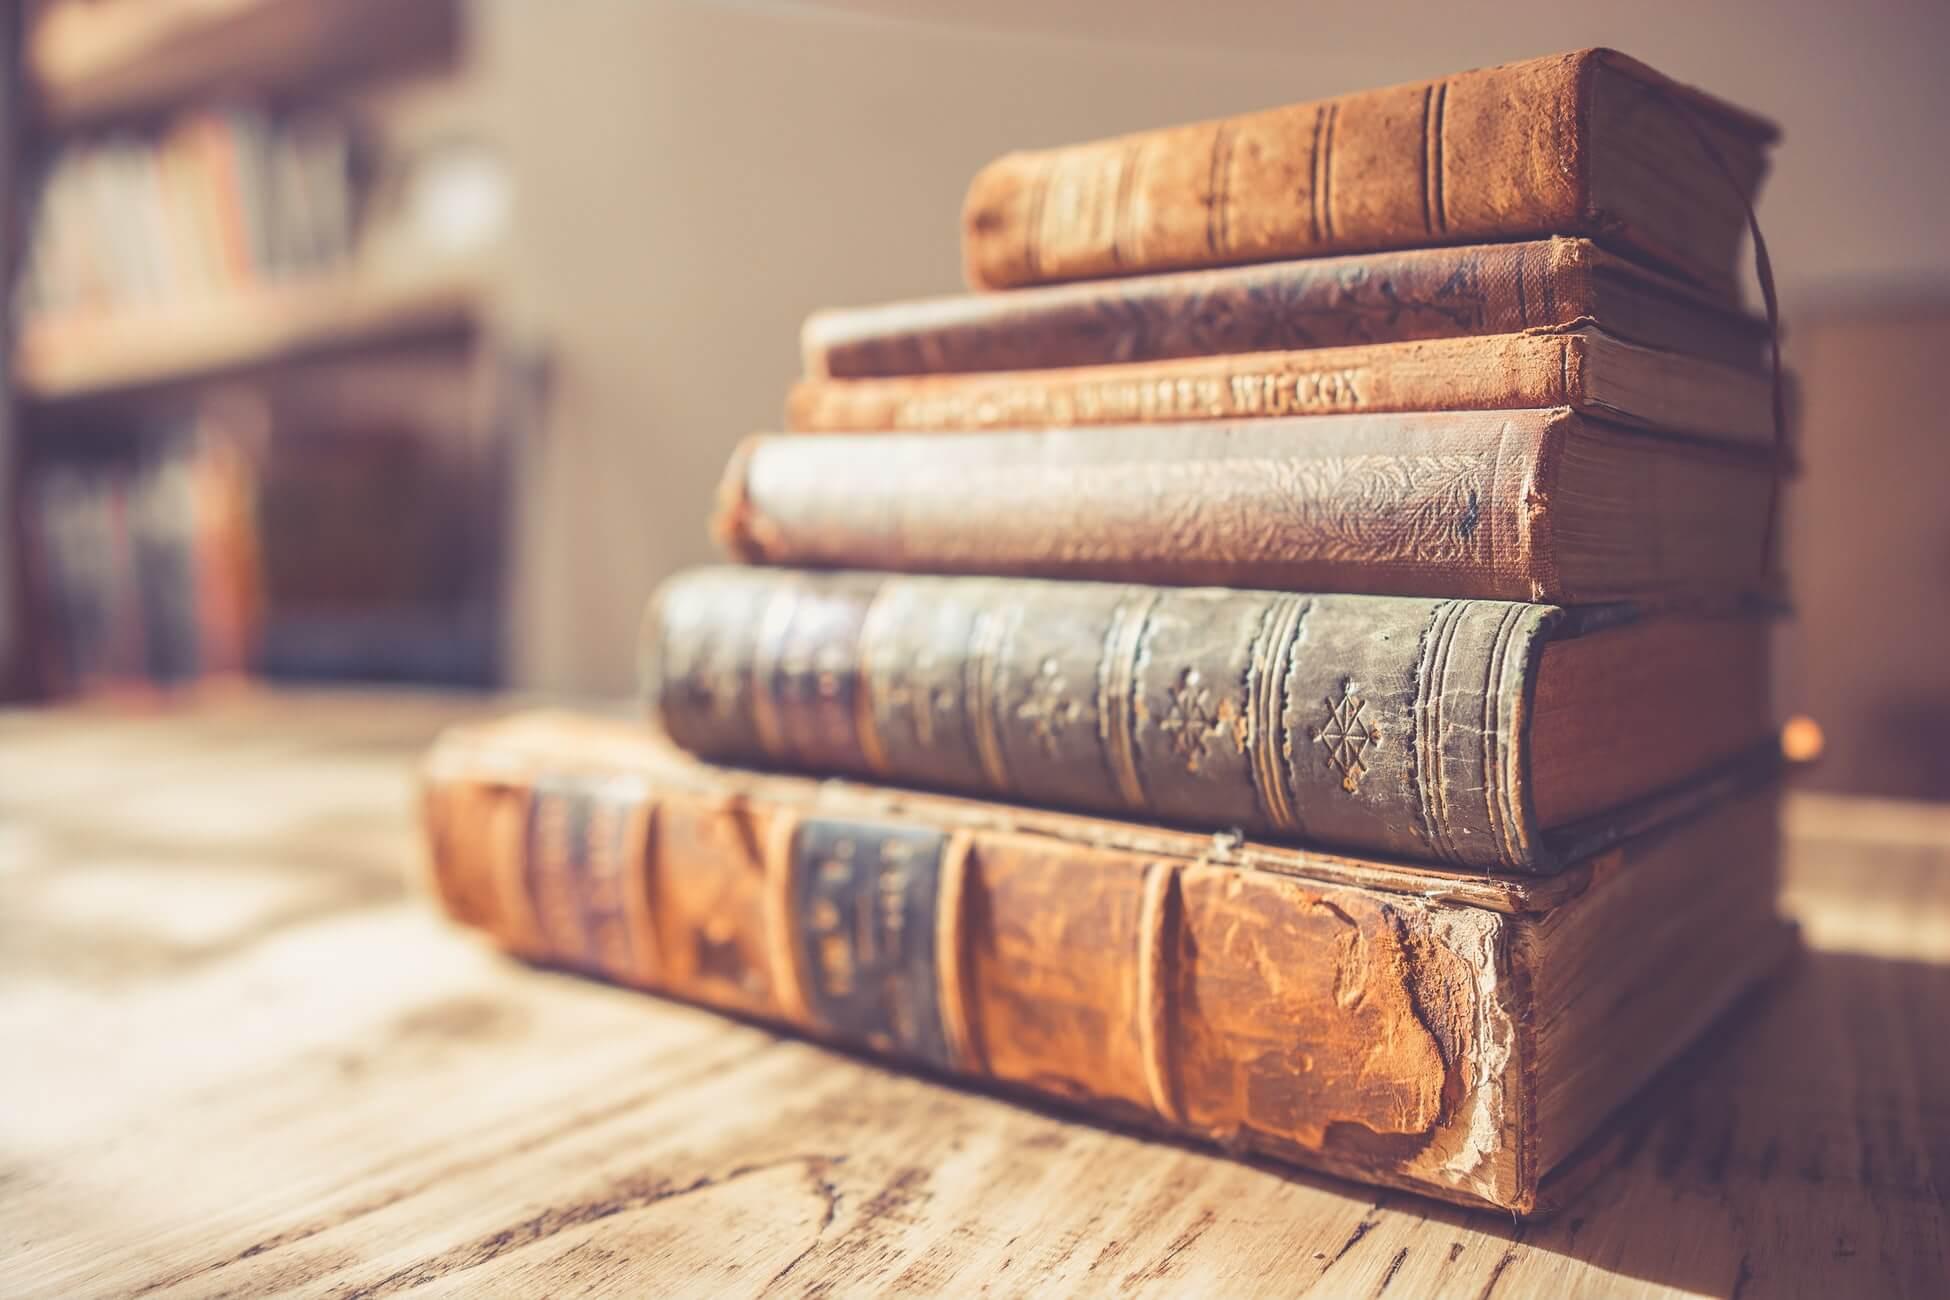 A Peek at the Montessori History Curriculum